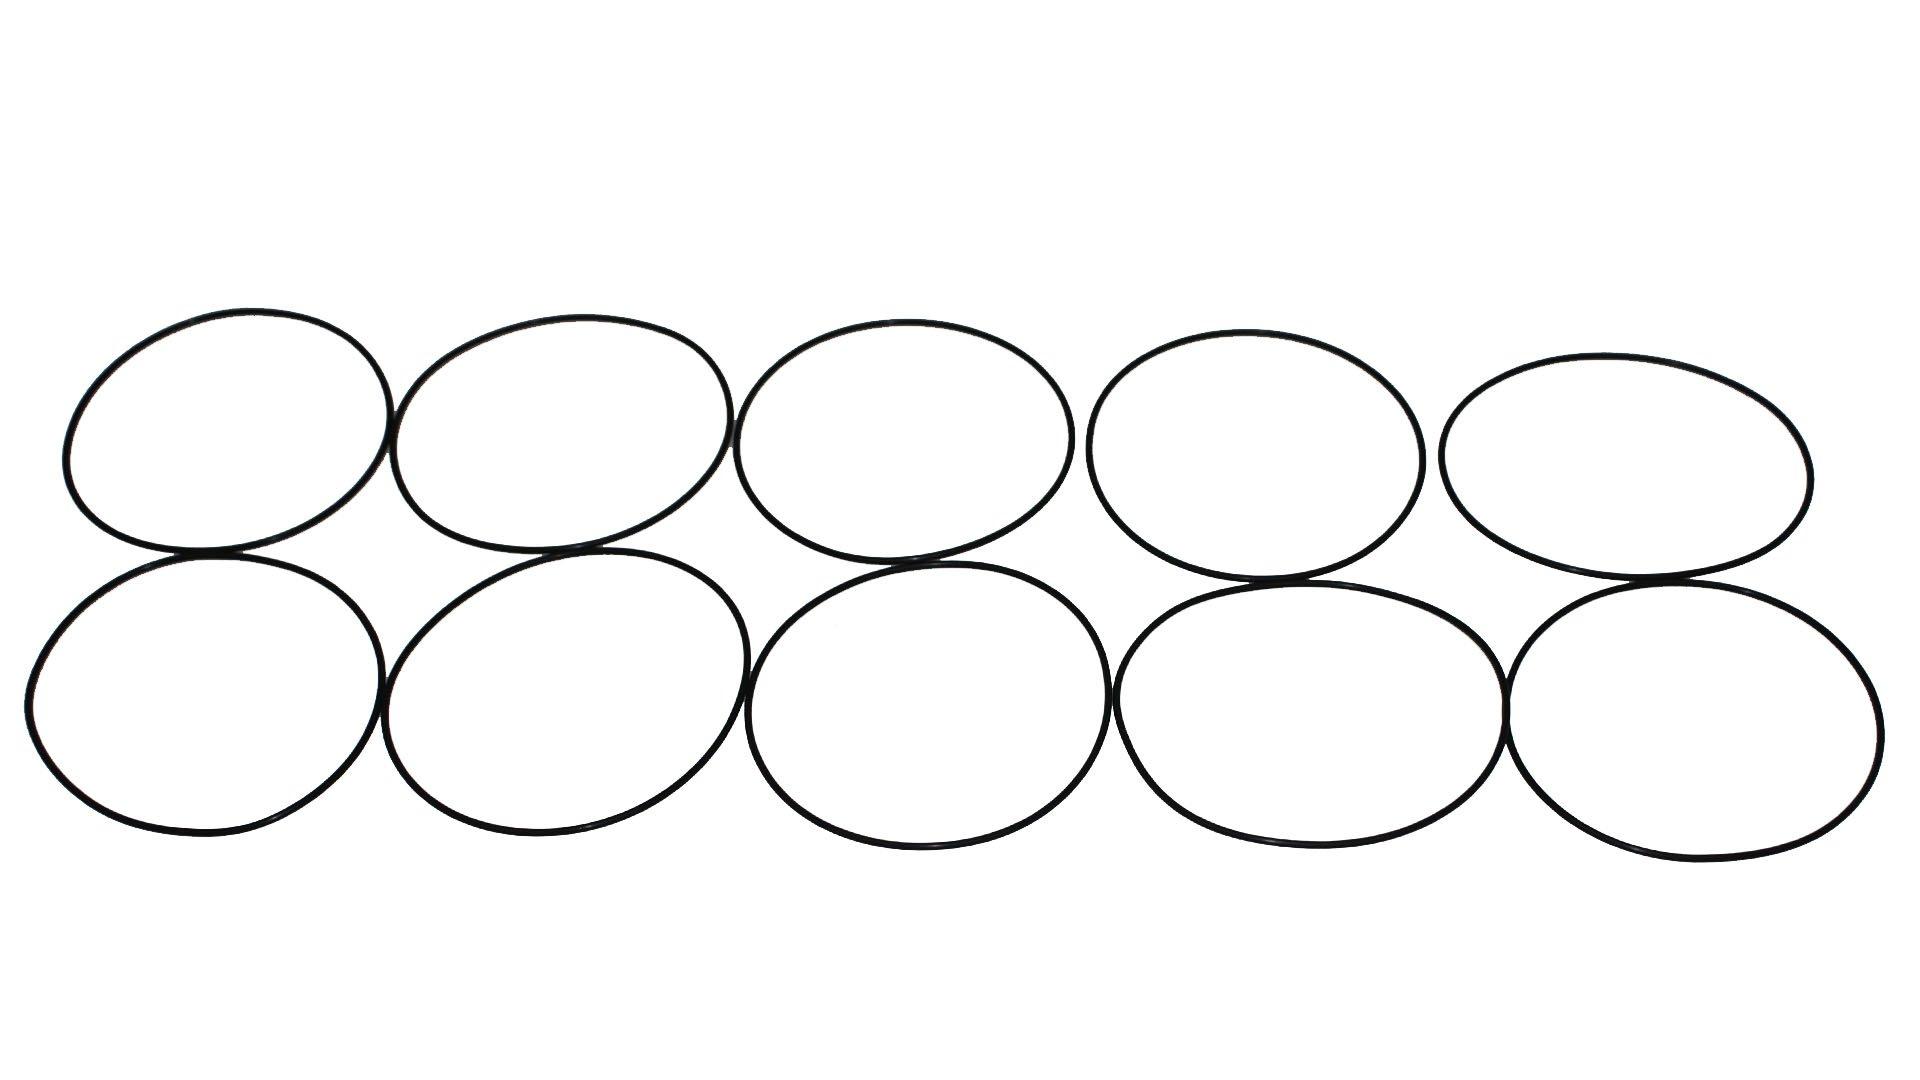 Sterling Seal ORVT345x10 Viton Number-345 Standard O-Ring, Fluoropolymer Elastomer, 70 Durometer Hardness, 4'' ID, 4-3/8'' OD (Pack of 10)